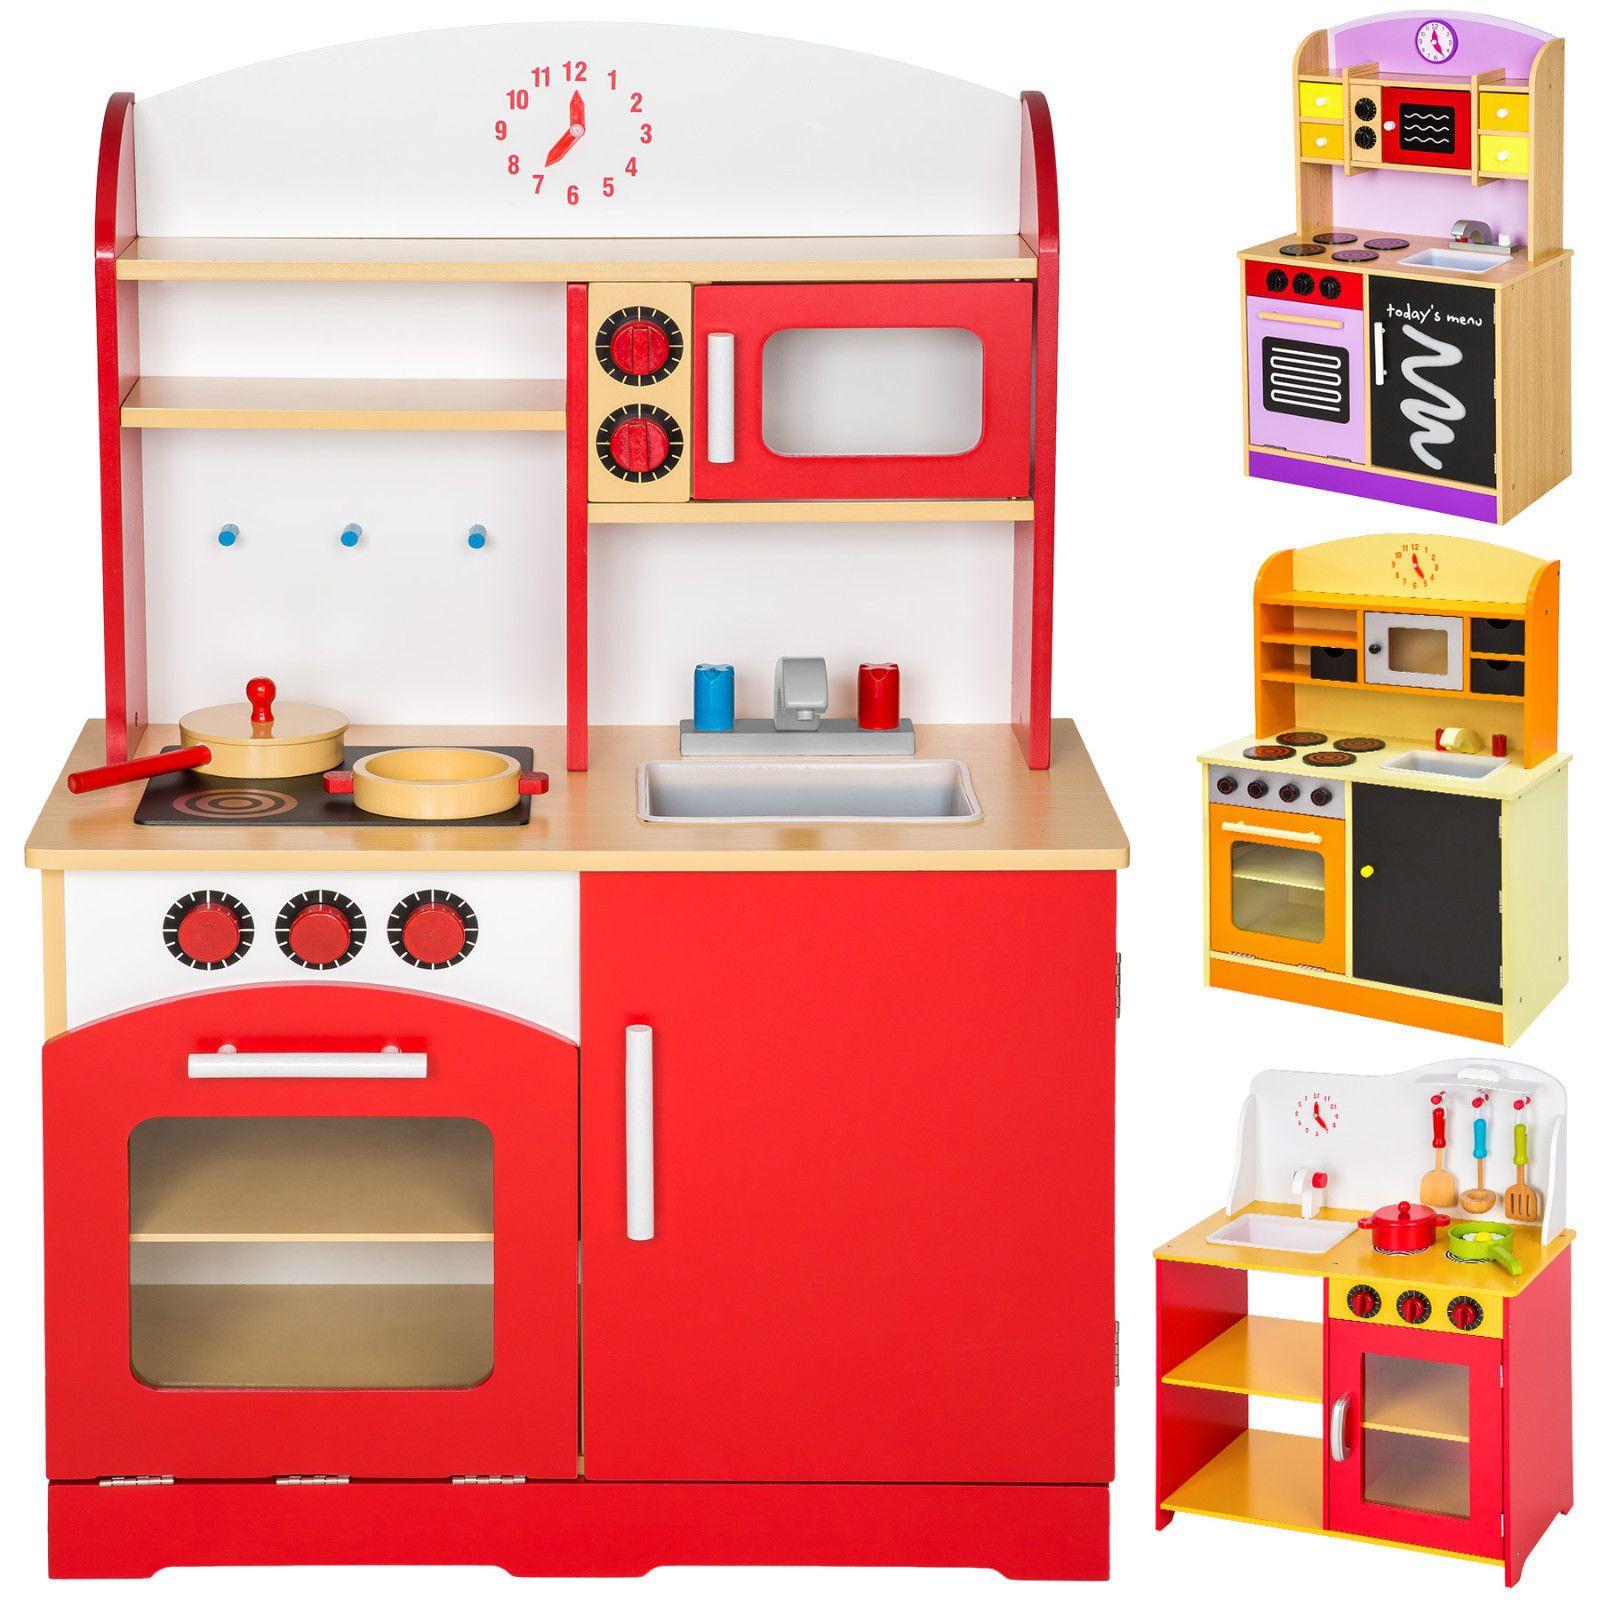 Cocina de madera de juguete para ni os juguete juego de for Cocina ninos juguete